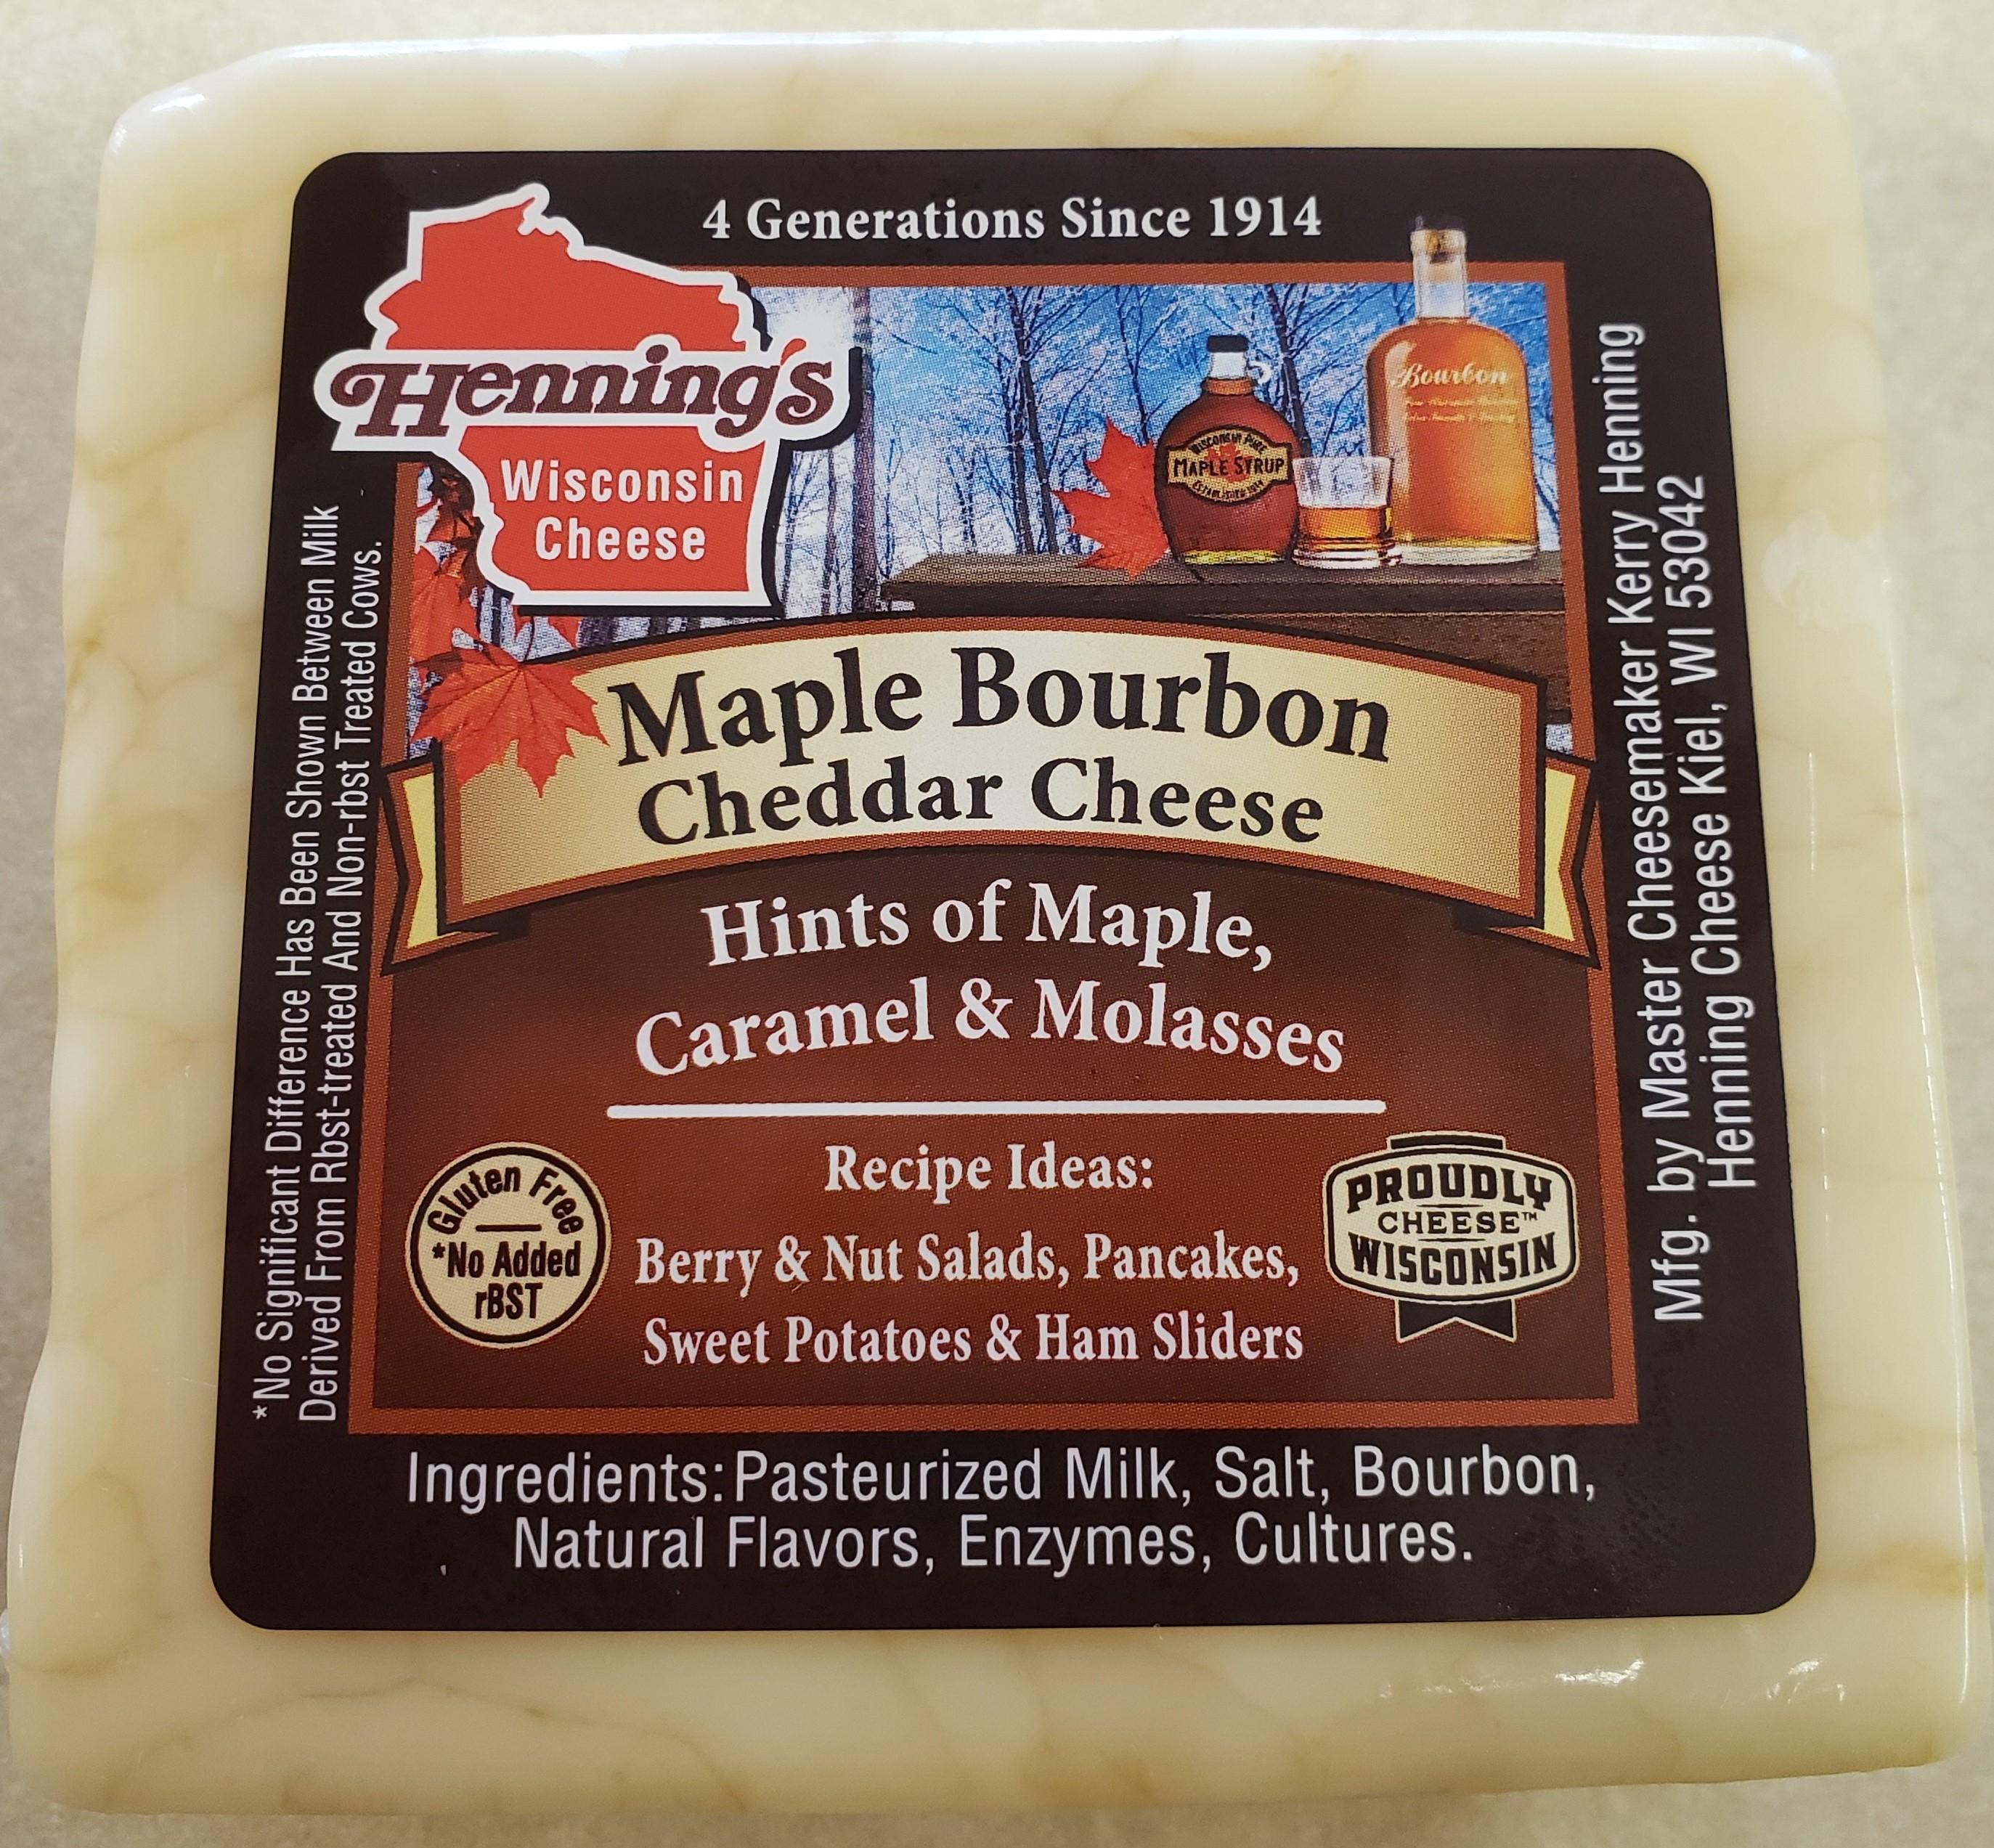 Henning's Maple Bourbon Cheddar Cheese